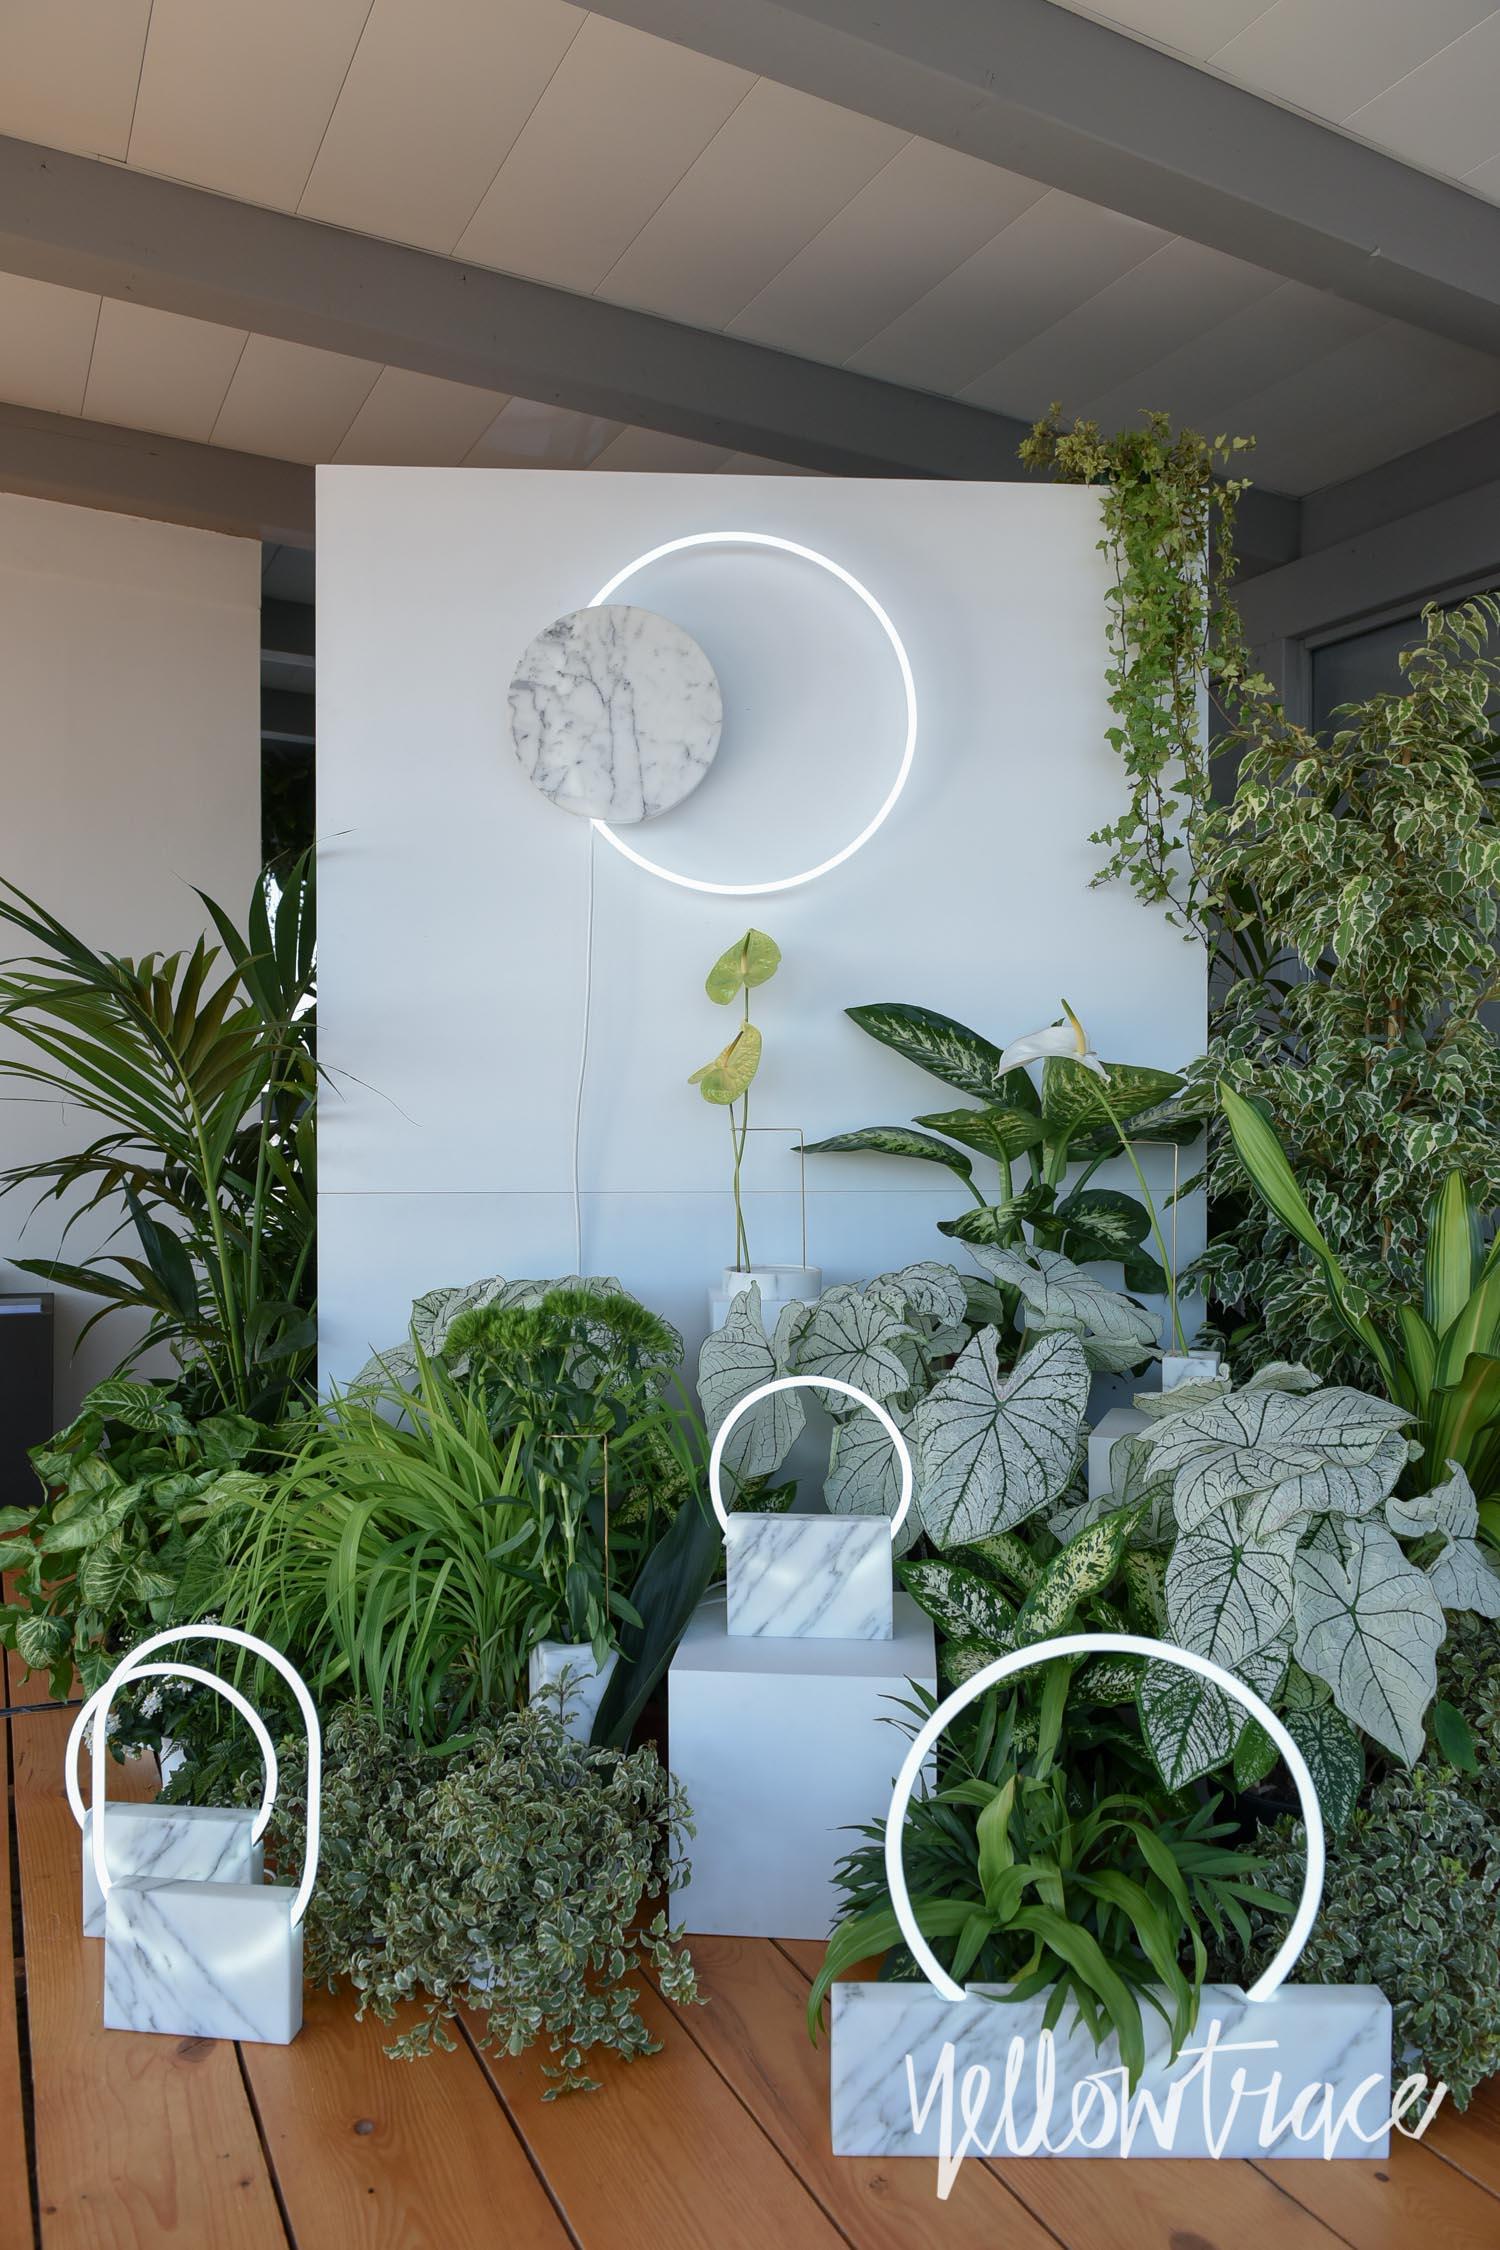 Milan Design Week 2017 Highlights, Bloc Studios at Martina Gamboni, Photo © Nick Hughes | #Milantrace2017